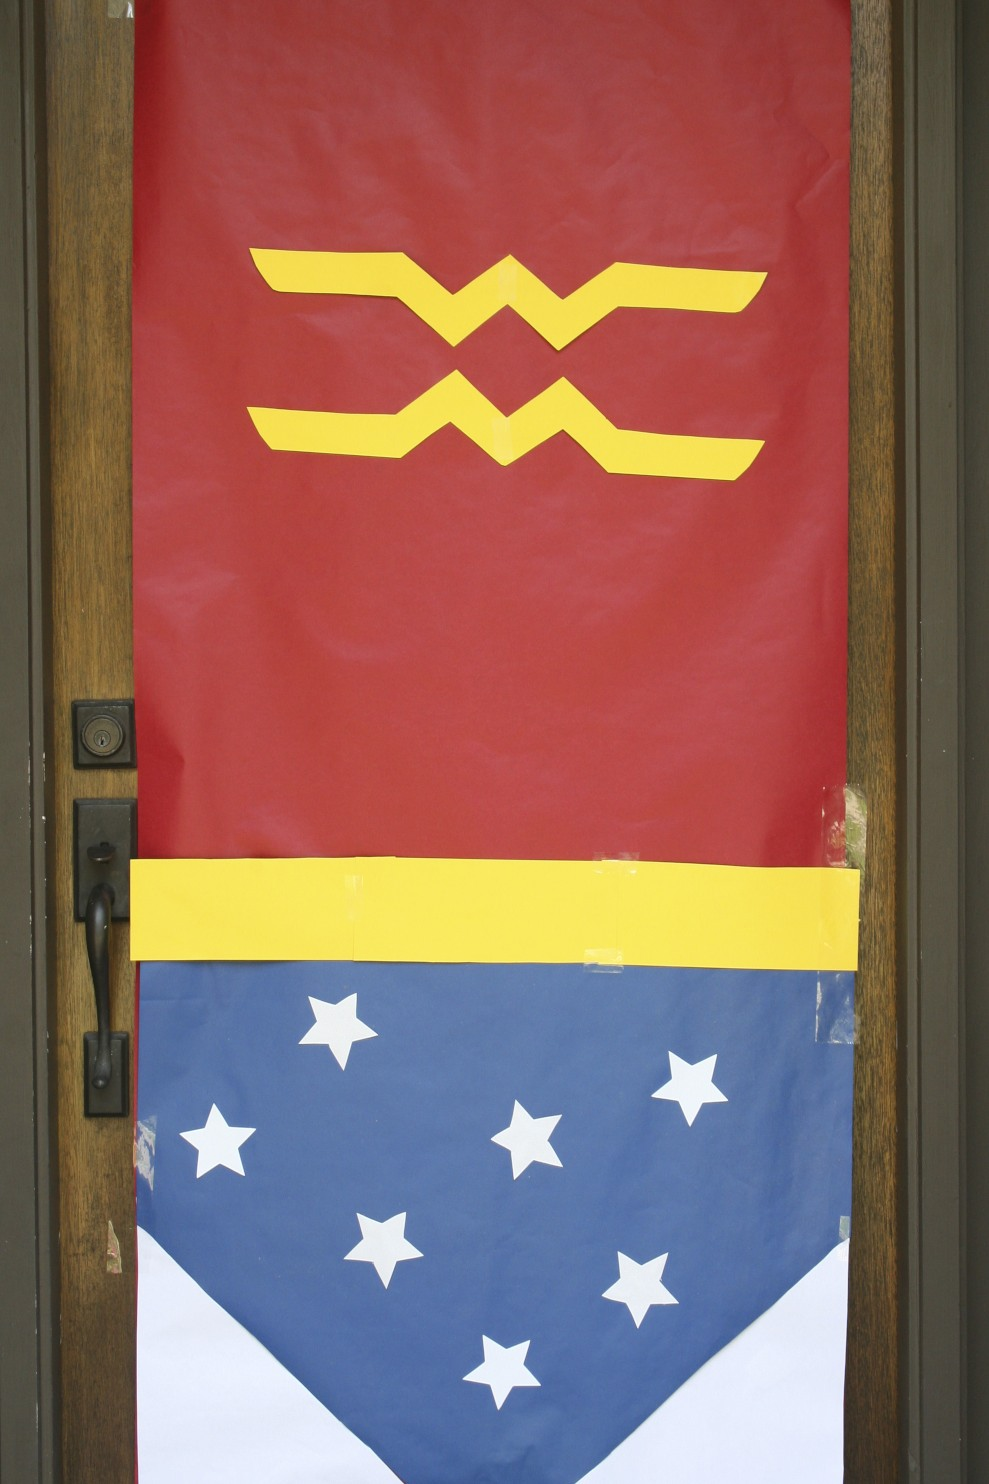 Elzabelz: Wonder Woman Party in Pictures